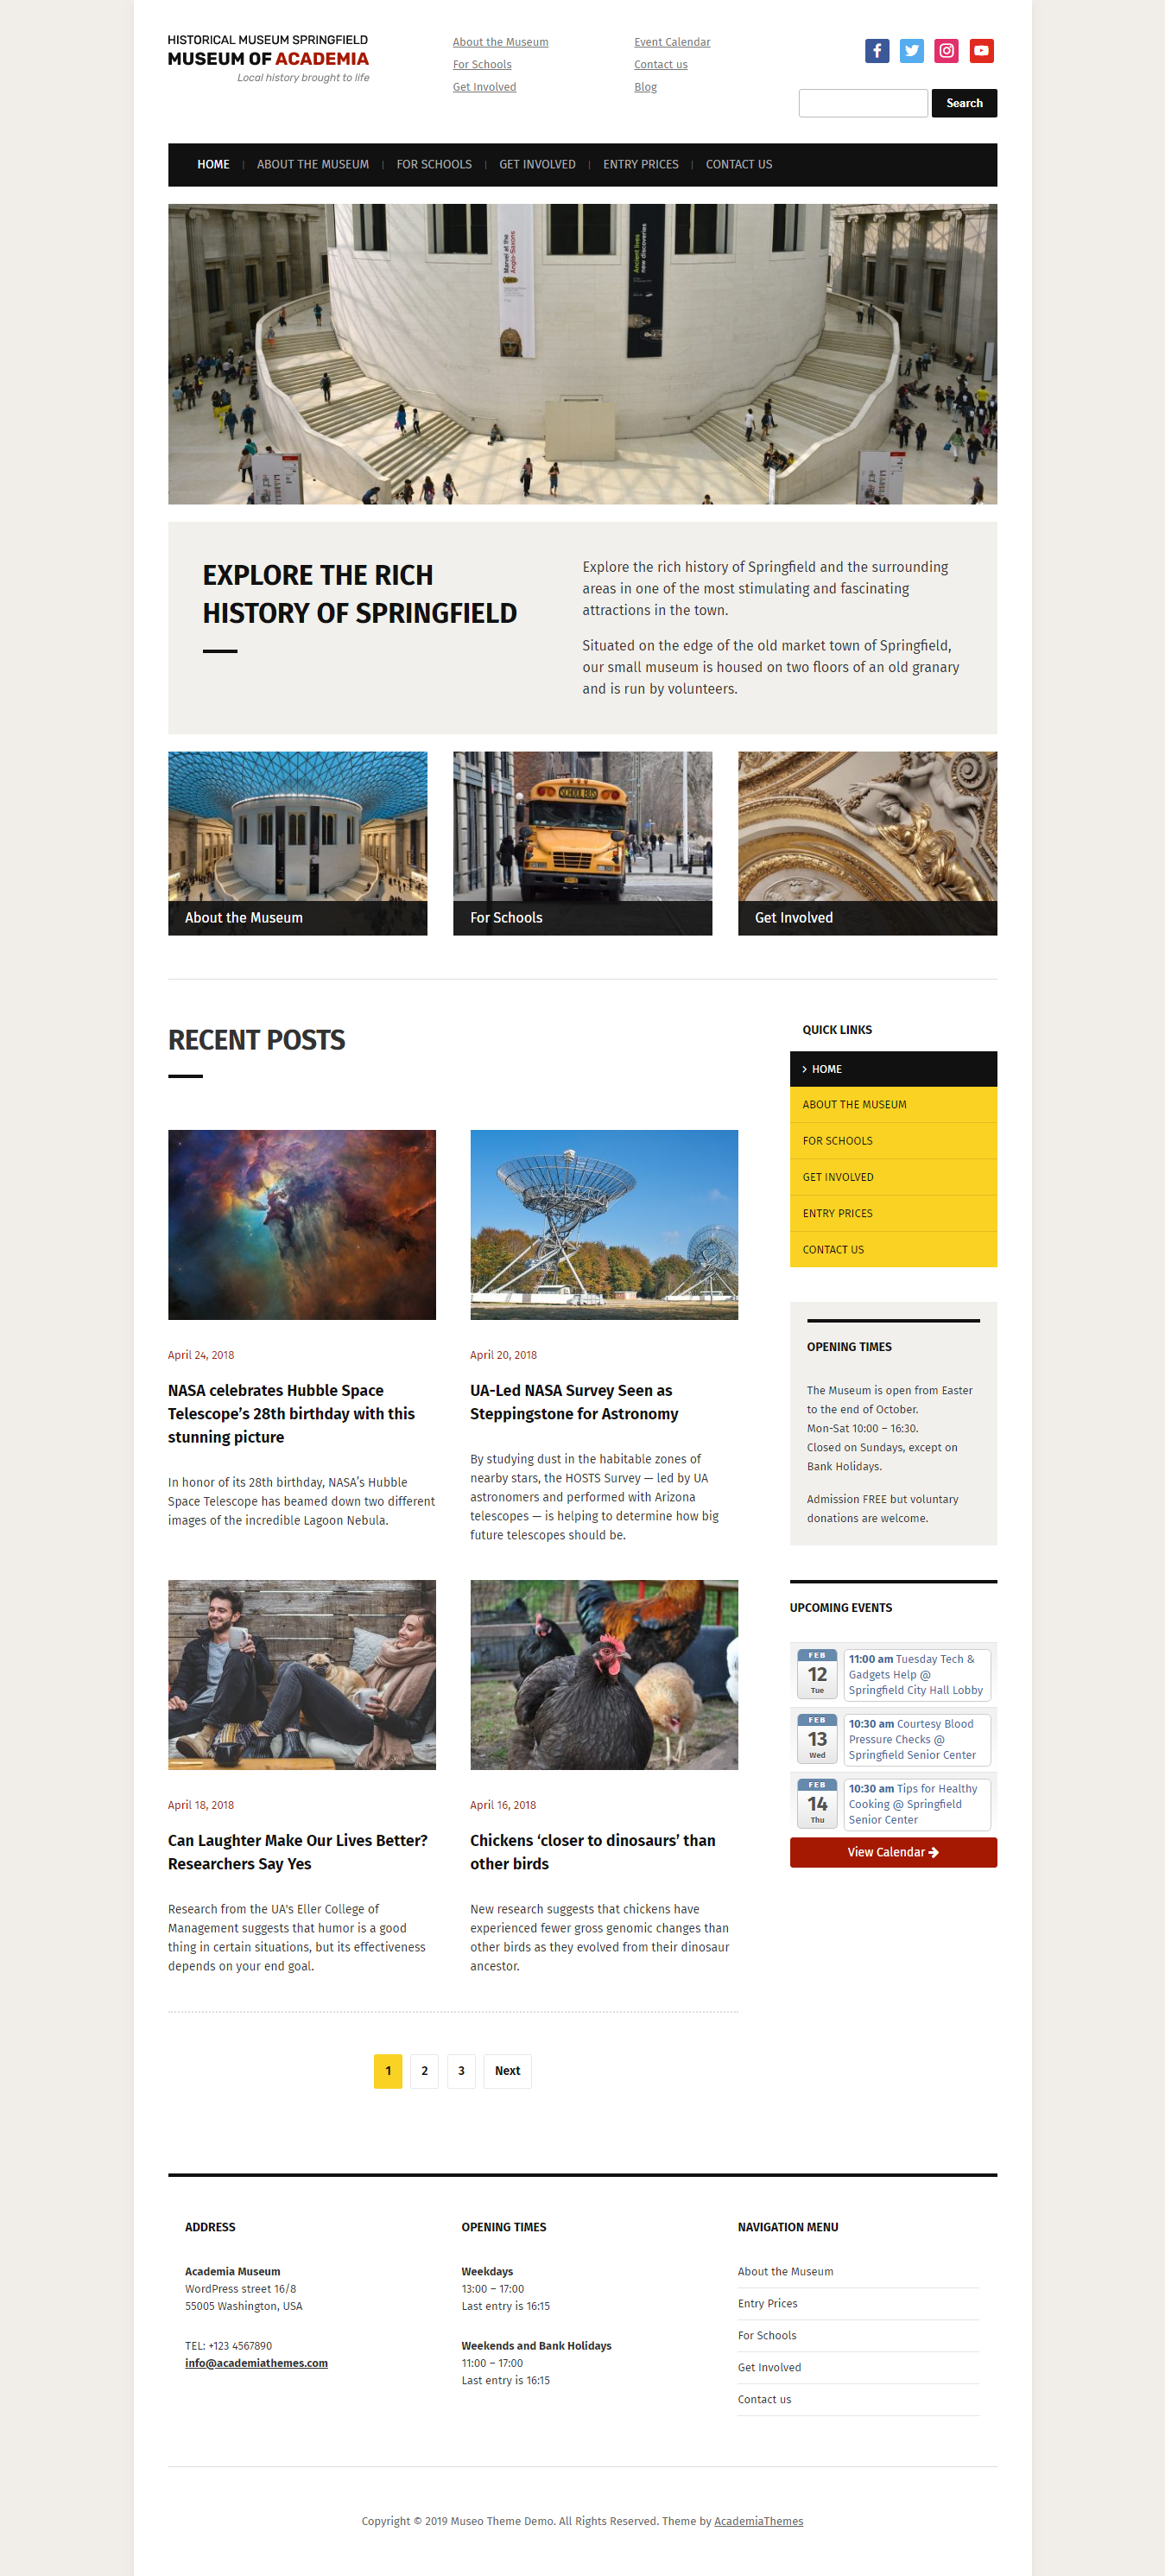 museo best free church wordpress theme - 10+ Best Free WordPress Church Themes